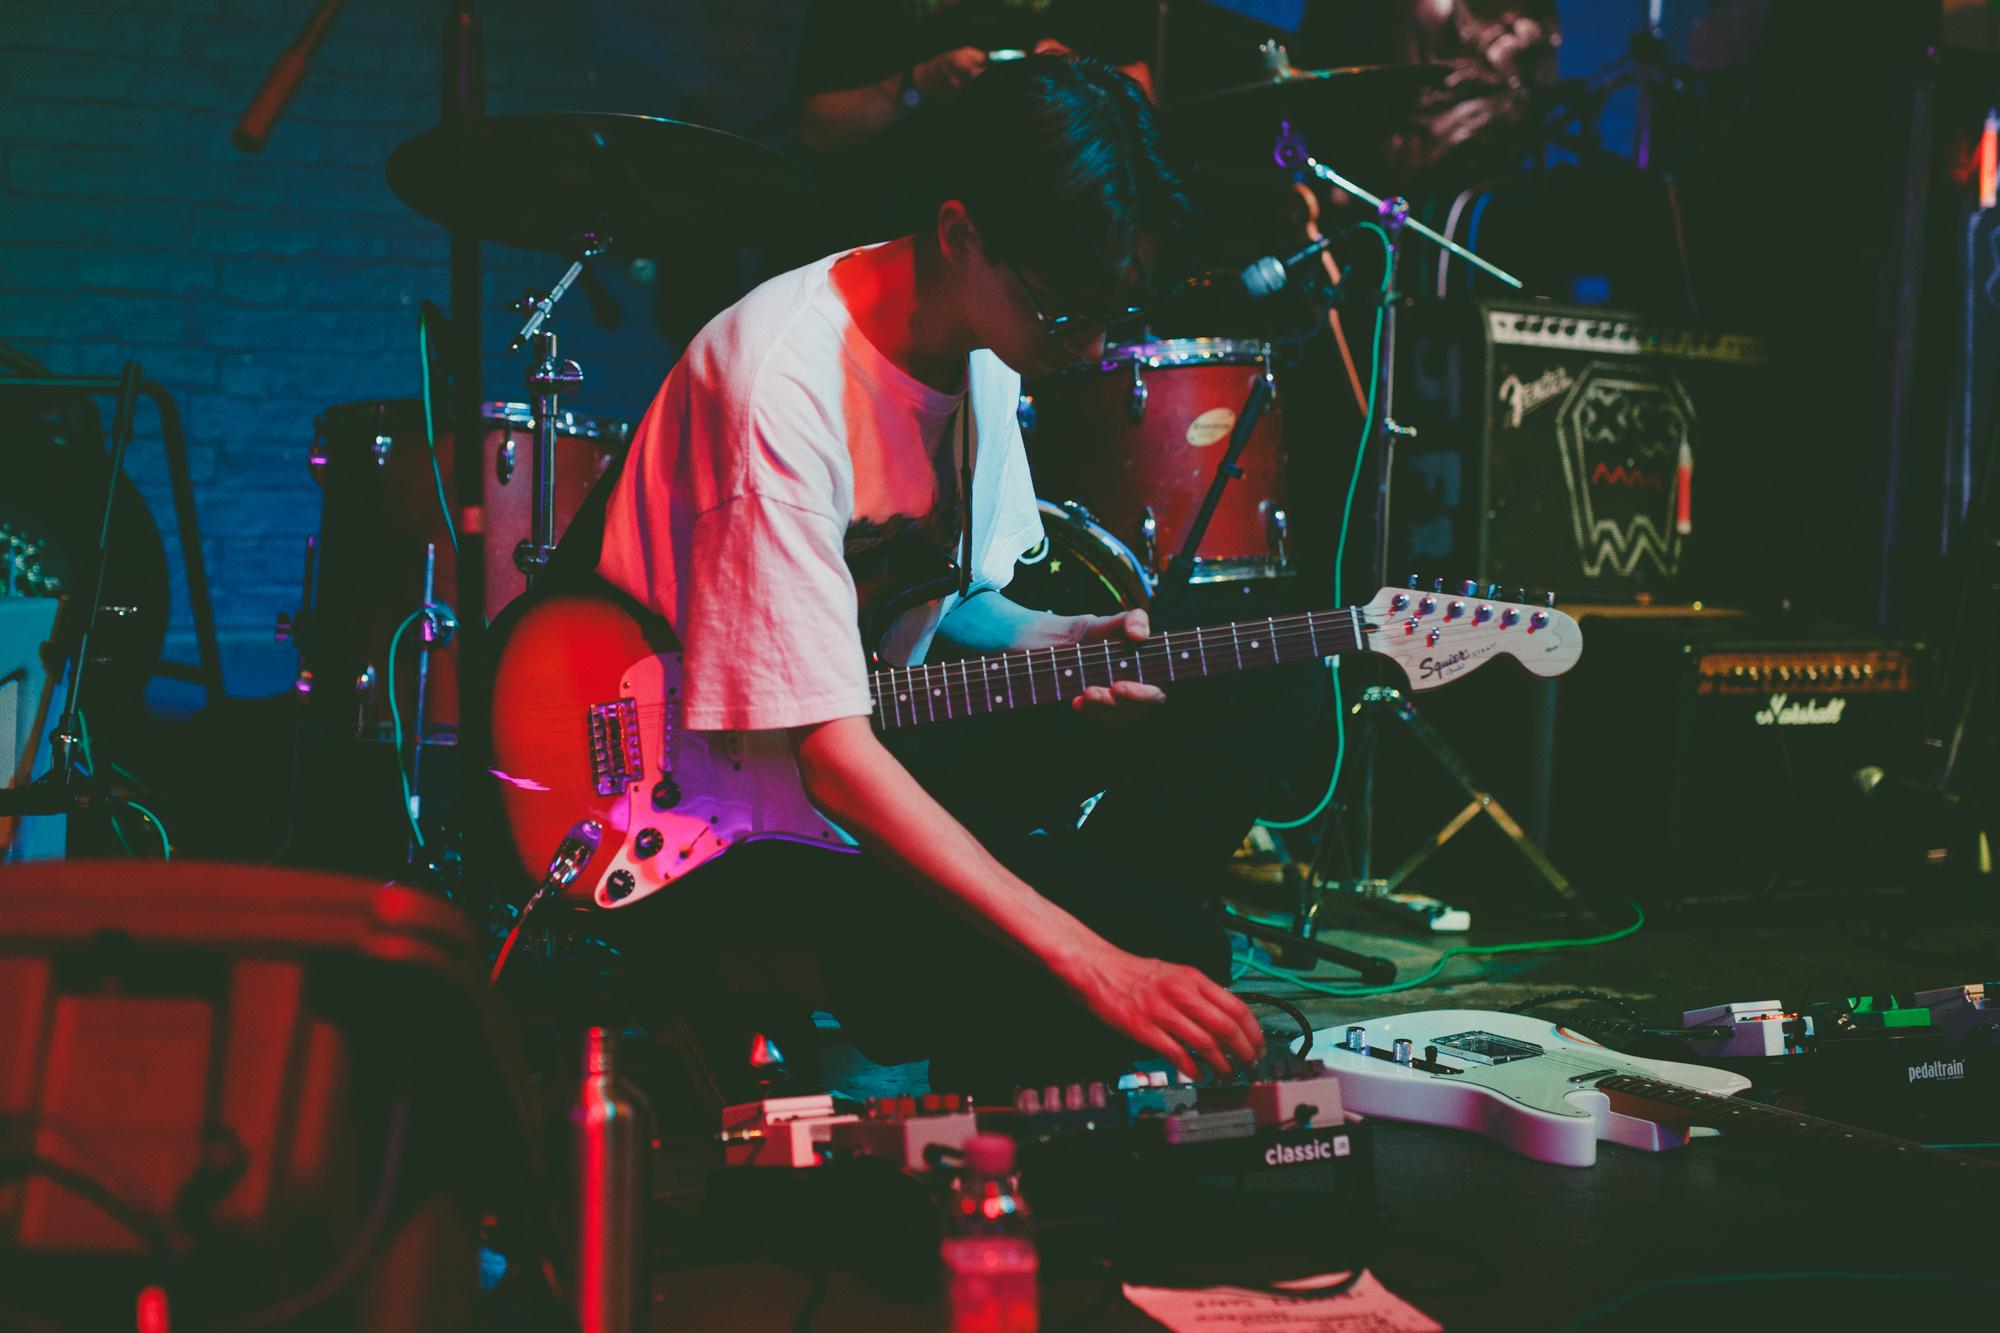 live-music-photography-london-uk-johnny-foreigner-camden-1.jpg